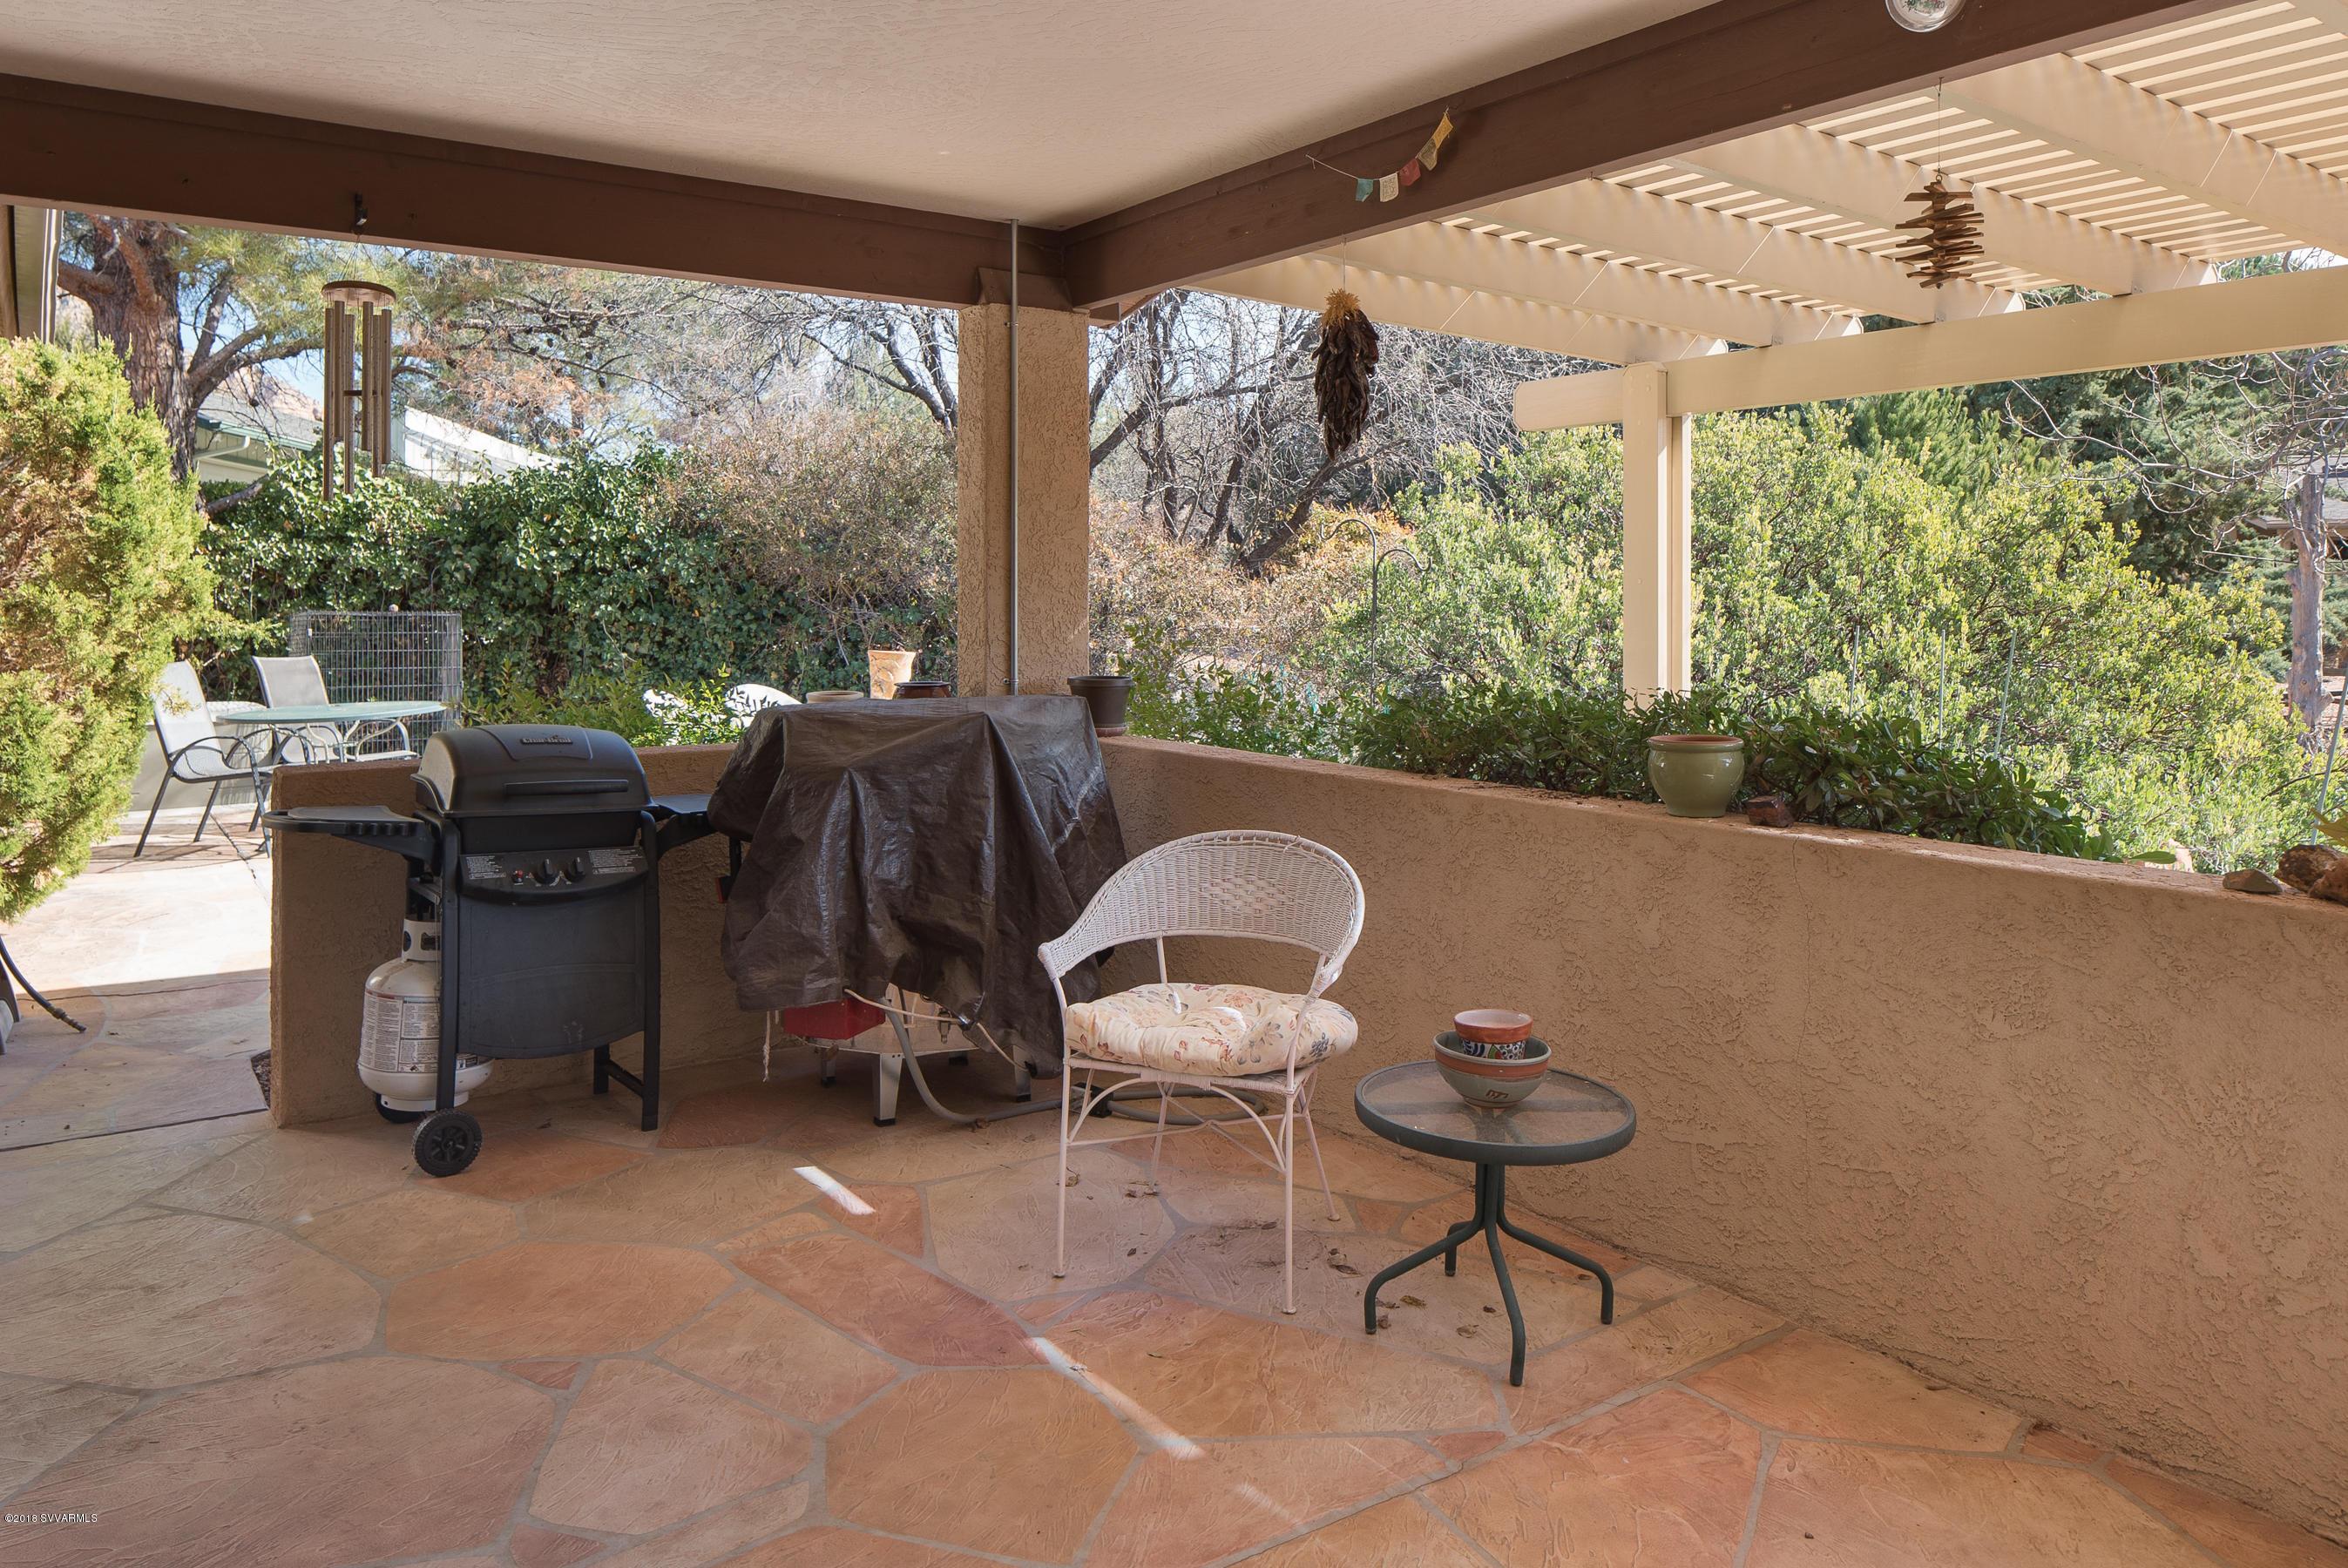 20 Broken Lance Way Sedona, AZ 86351